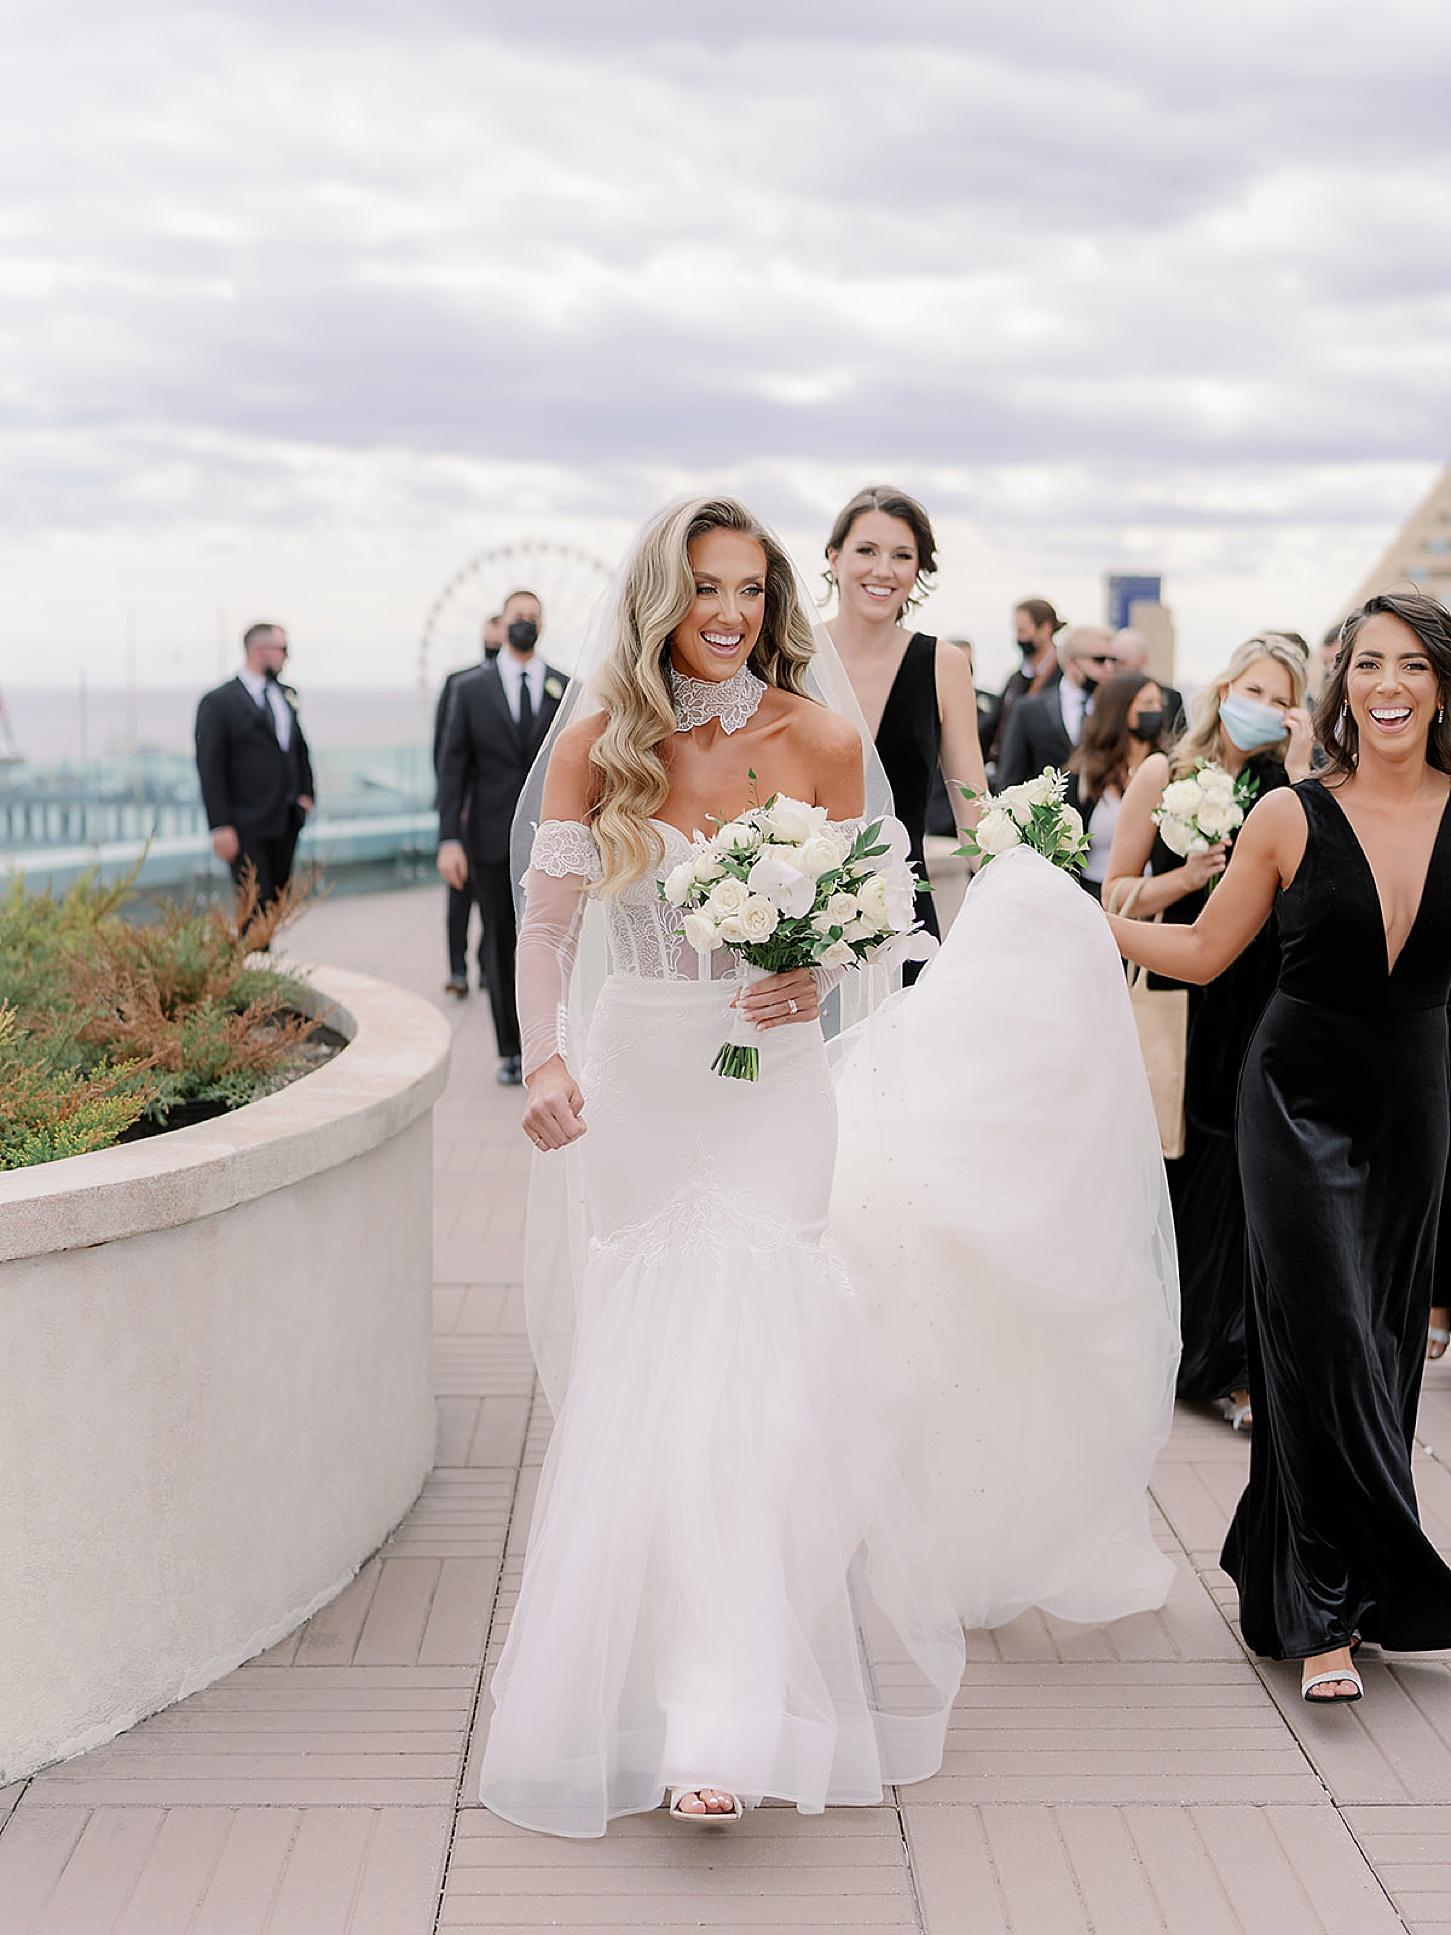 Atlantic City Wedding Photography Studio by Magdalena Studios Lexy Cha 0031